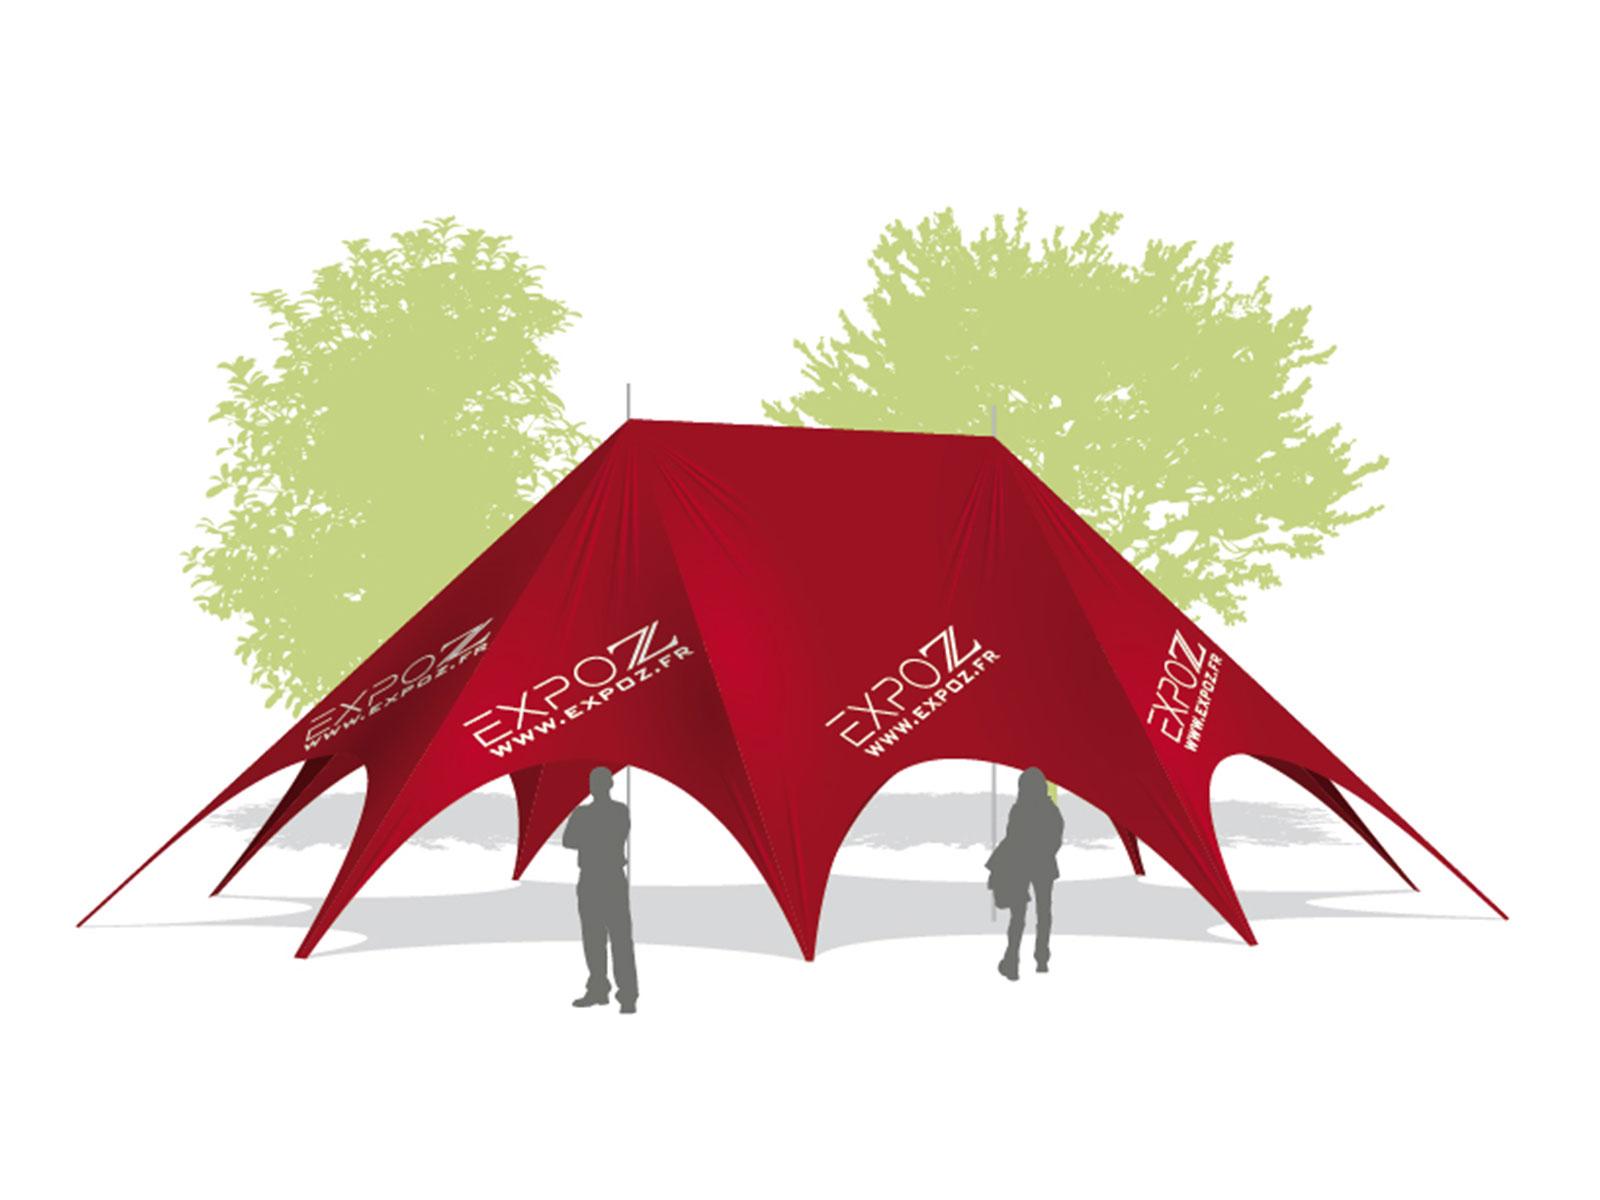 Tent Expo Star 16.5 m  sc 1 st  Expoz & Tent expo star 16.5 m - Reception tents - Expoz